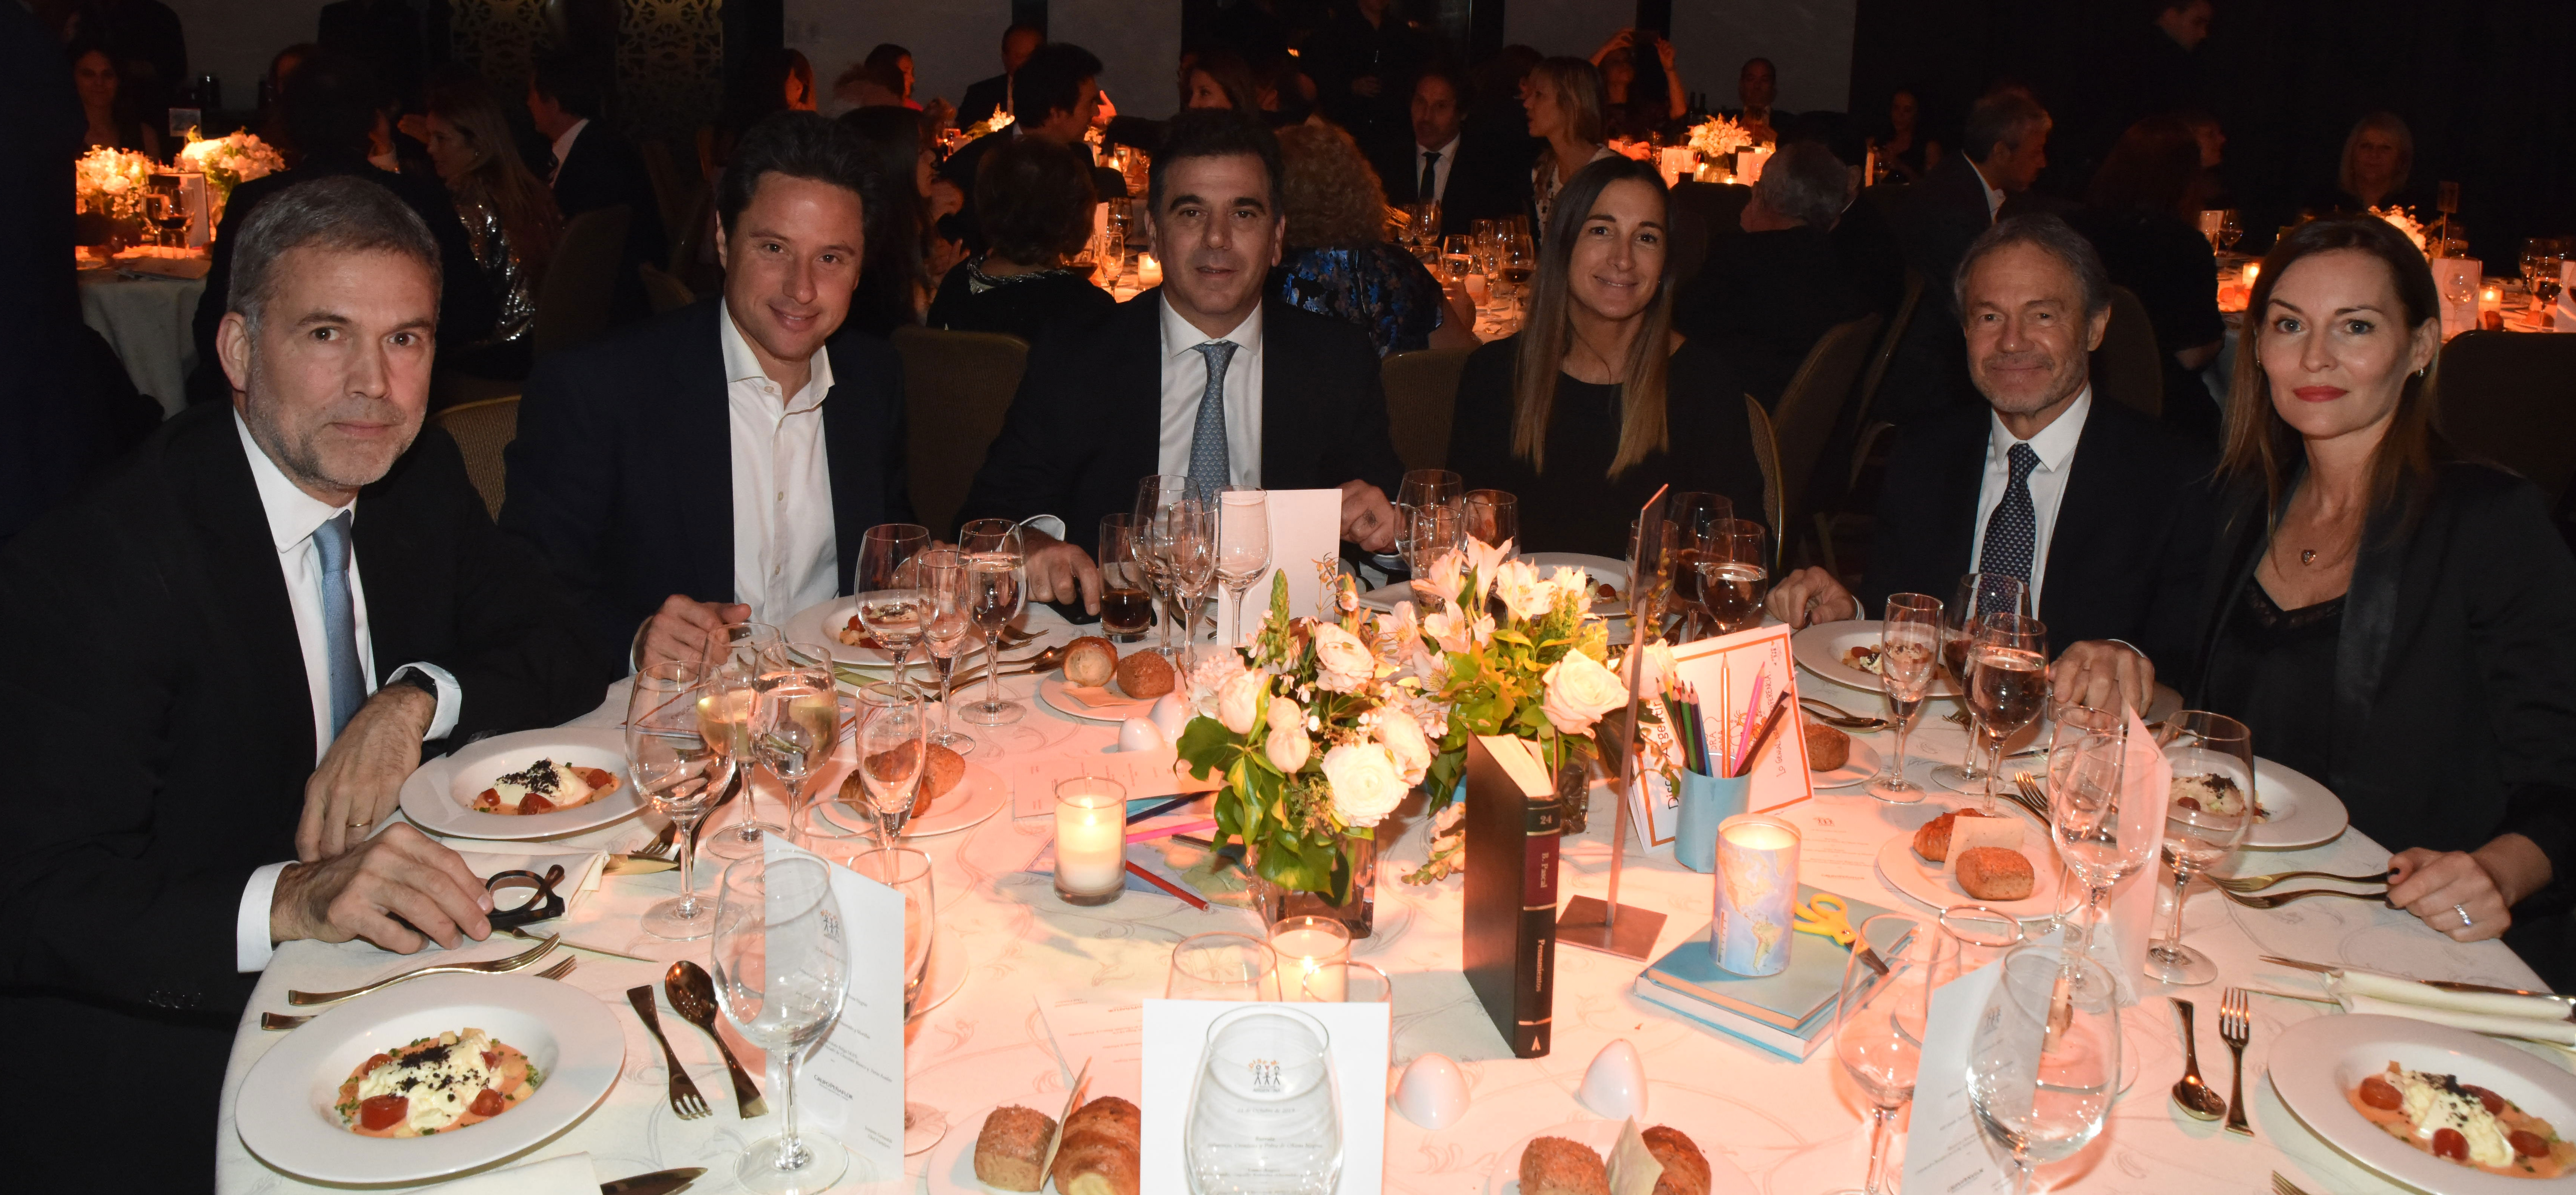 Augusto Rodríguez Larreta junto a Gabriel Sánchez Zinny, Cristian Ritondo y Gustavo Ferrari